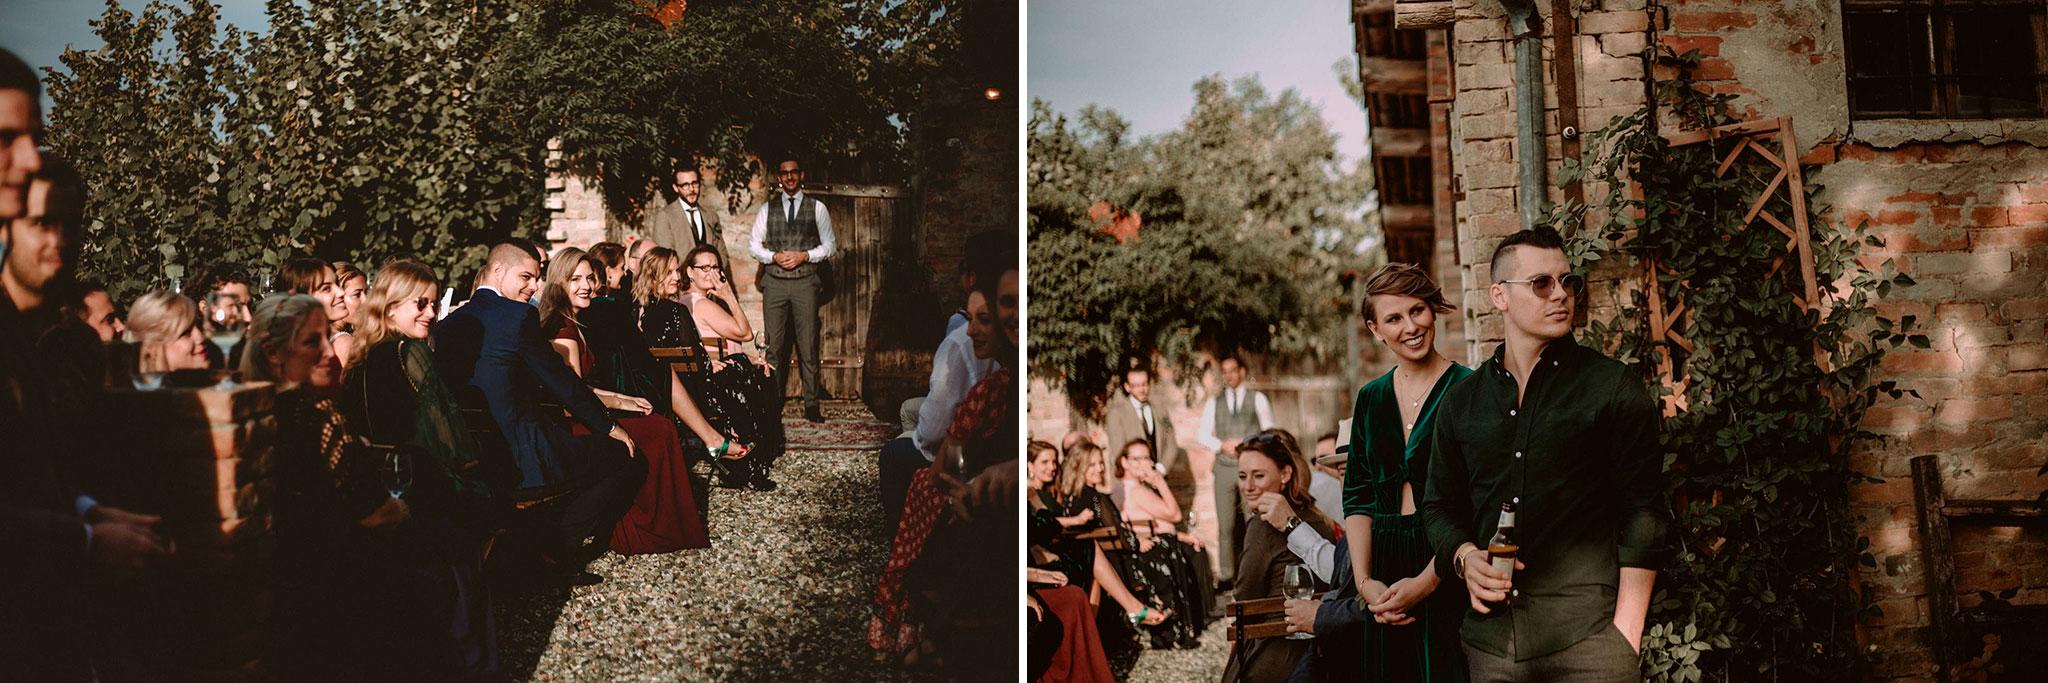 Wedding_Italy_03